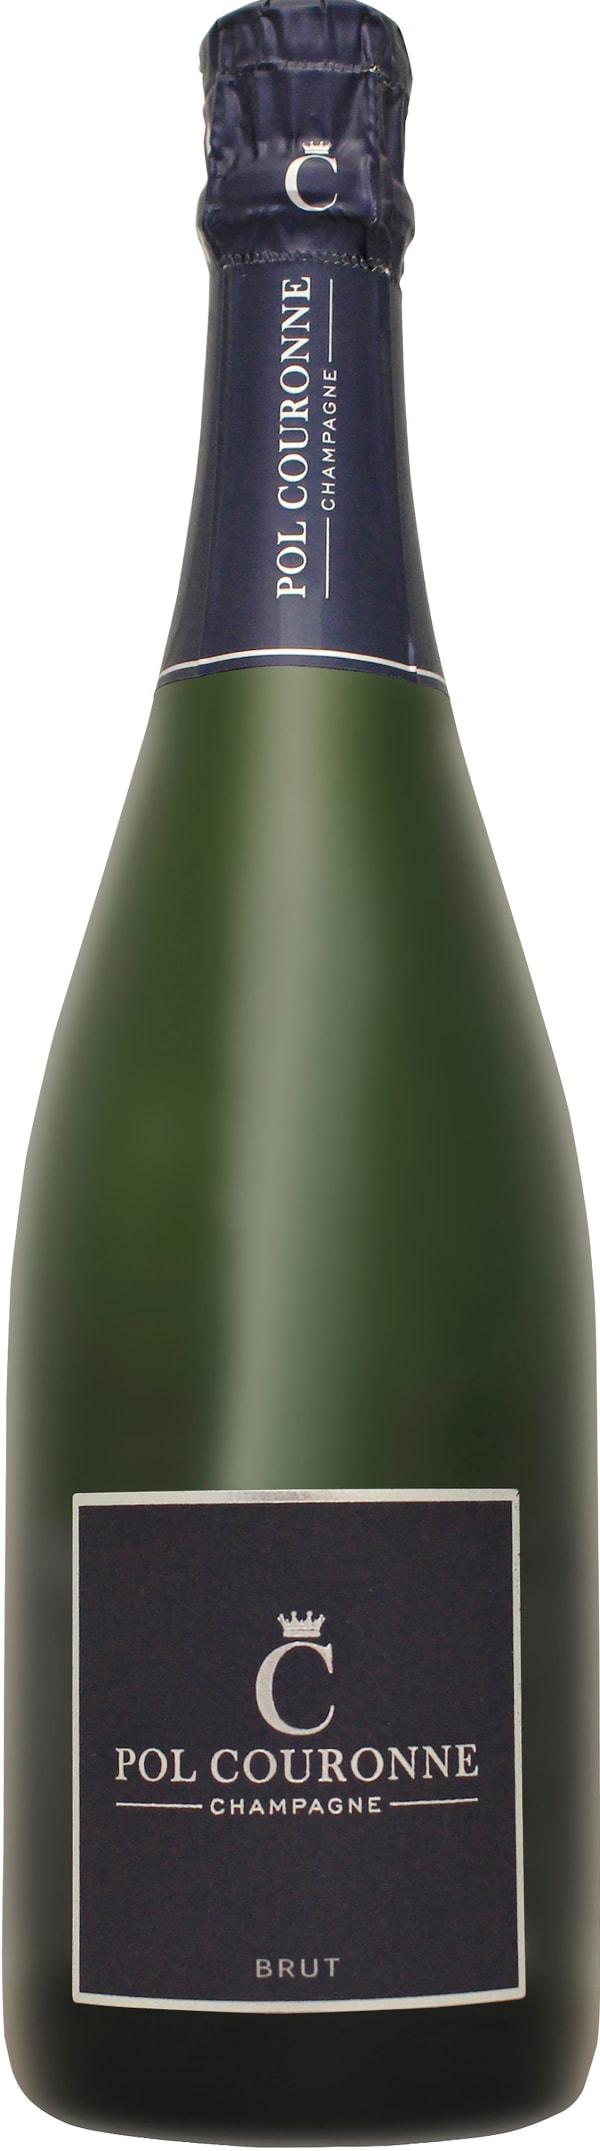 Pol Couronne Champagne Brut